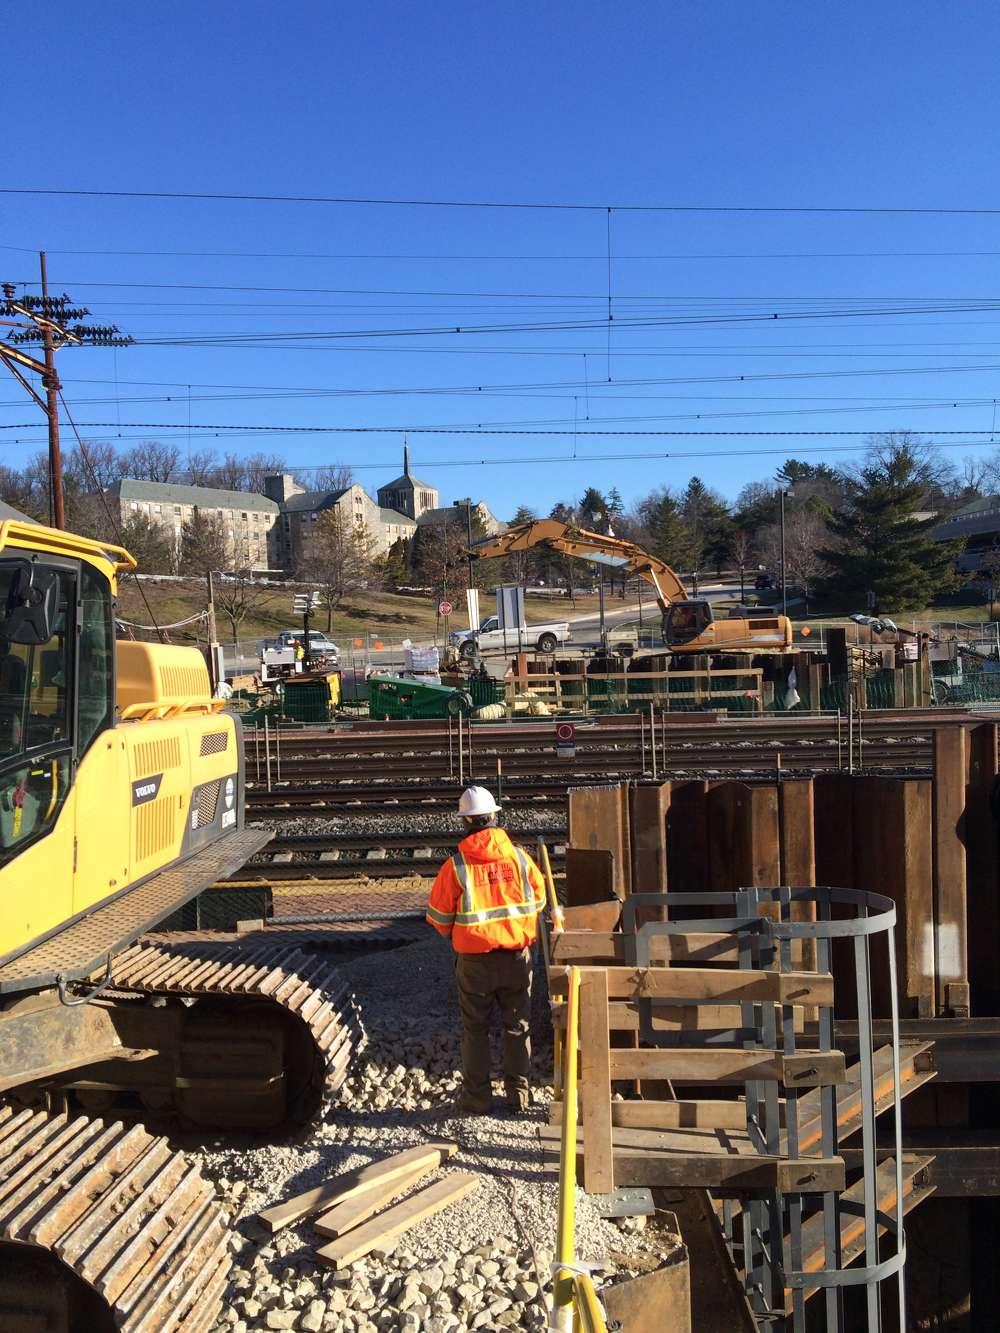 A  $30.6 million project that will modernize Villanova Station on the Paoli/Thorndale Regional Rail Line is making steady progress in Villanova, Pa.